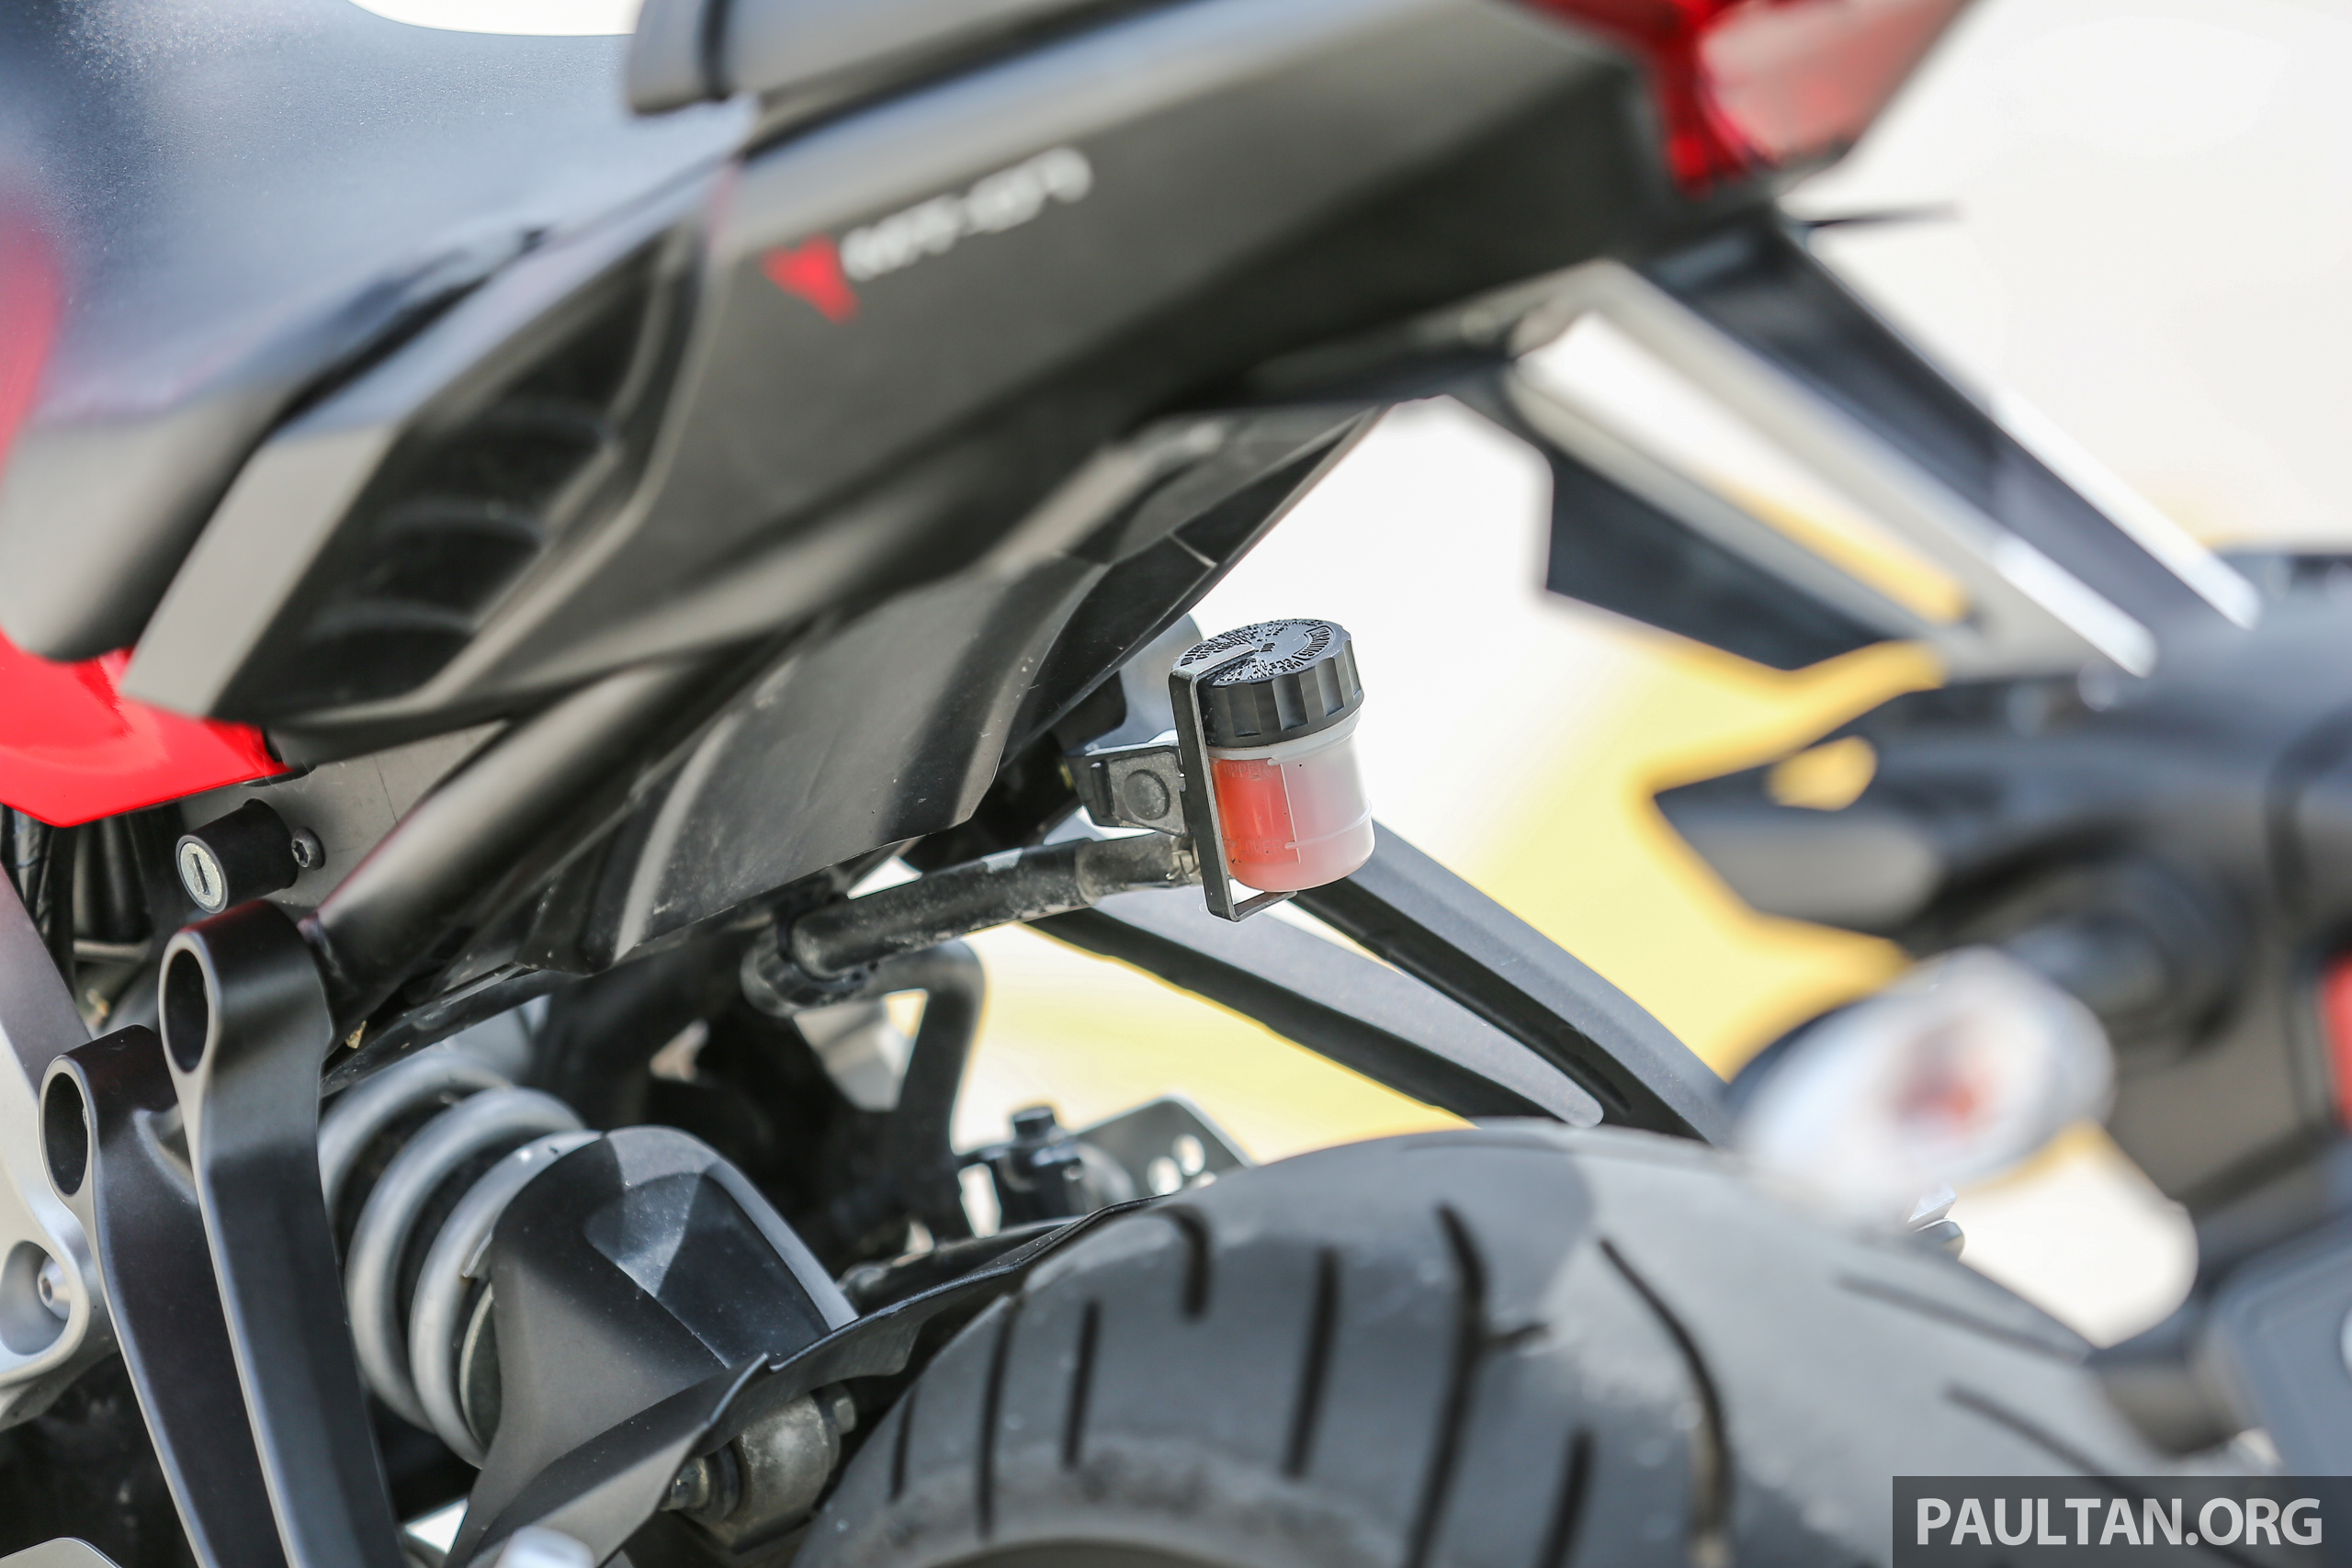 REVIEW: 2016 Yamaha MT-07 - a hooligan bike in commuter